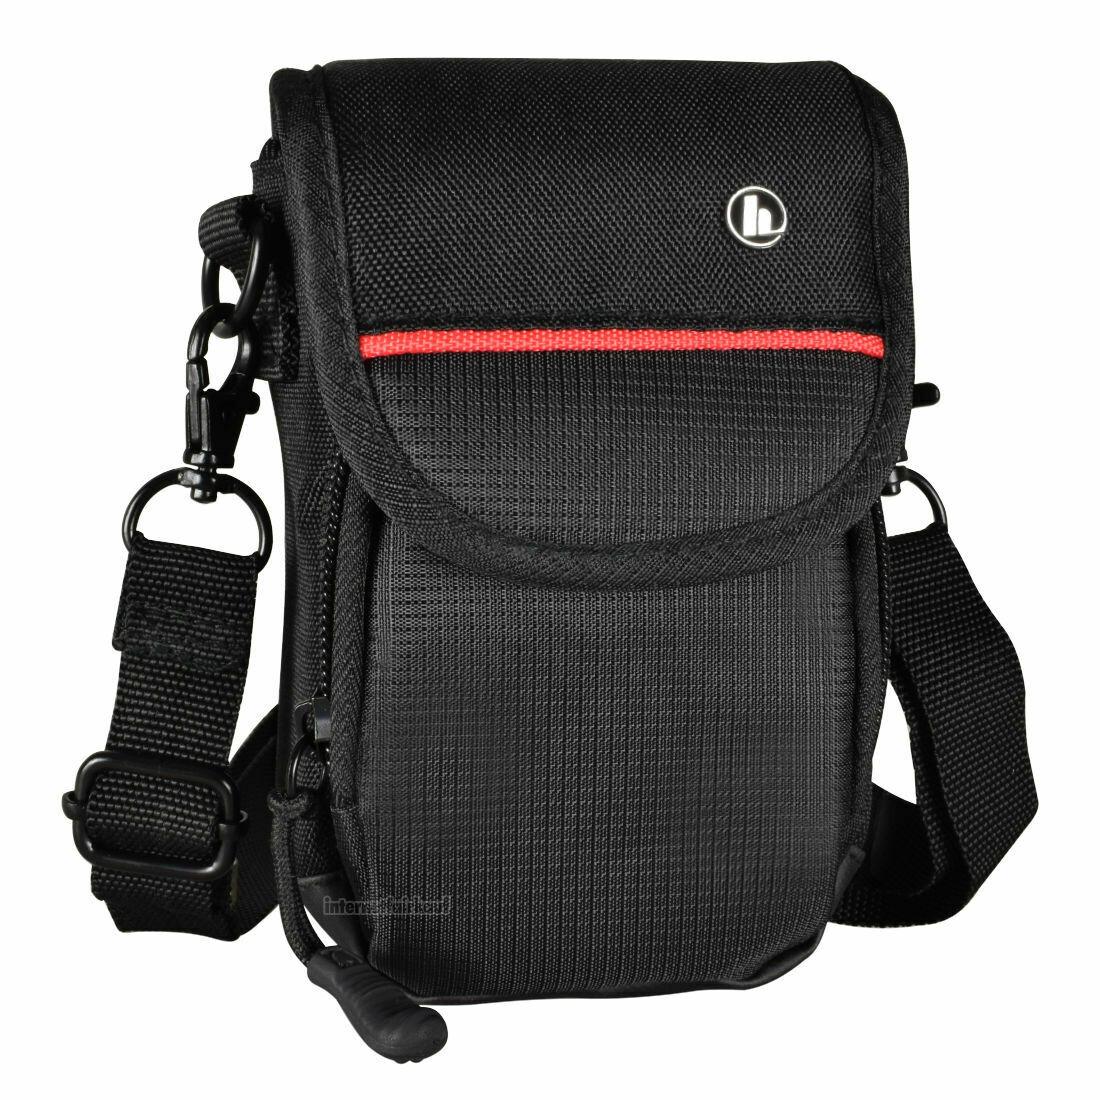 Fototasche passend für Panasonic Lumix TZ101 TZ81 TZ91 Kameratasche